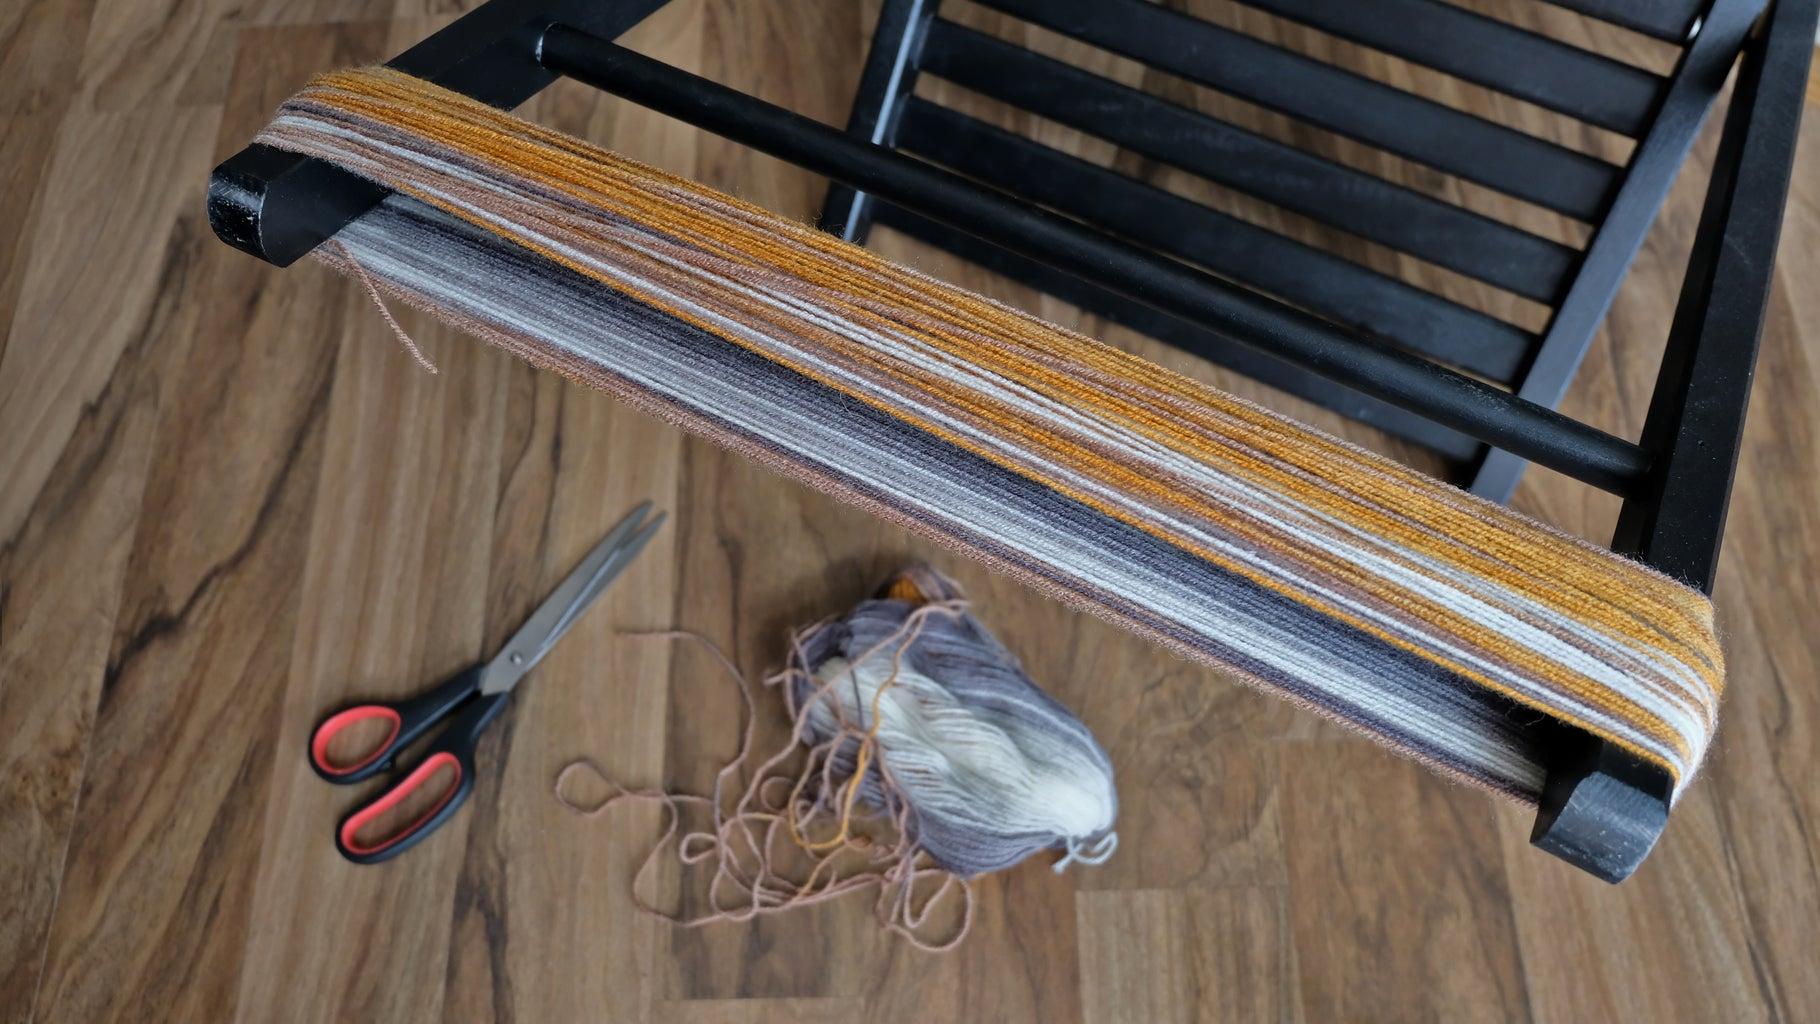 Making Pompoms. Winding